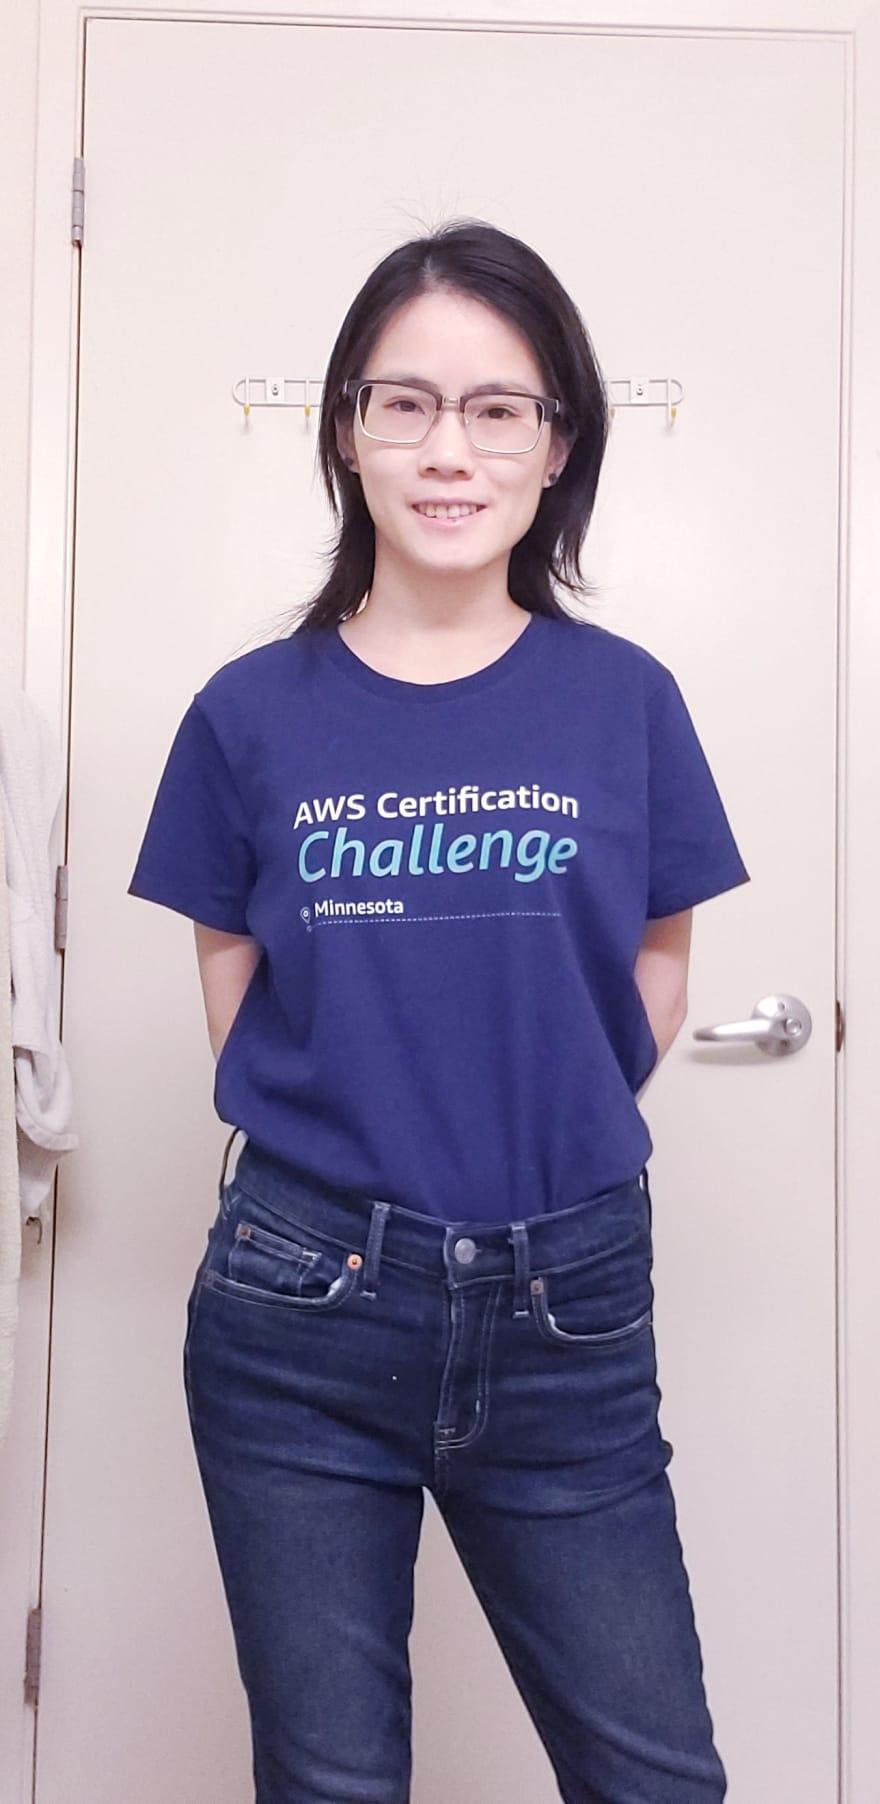 Amy wearing her AWS t-shirt